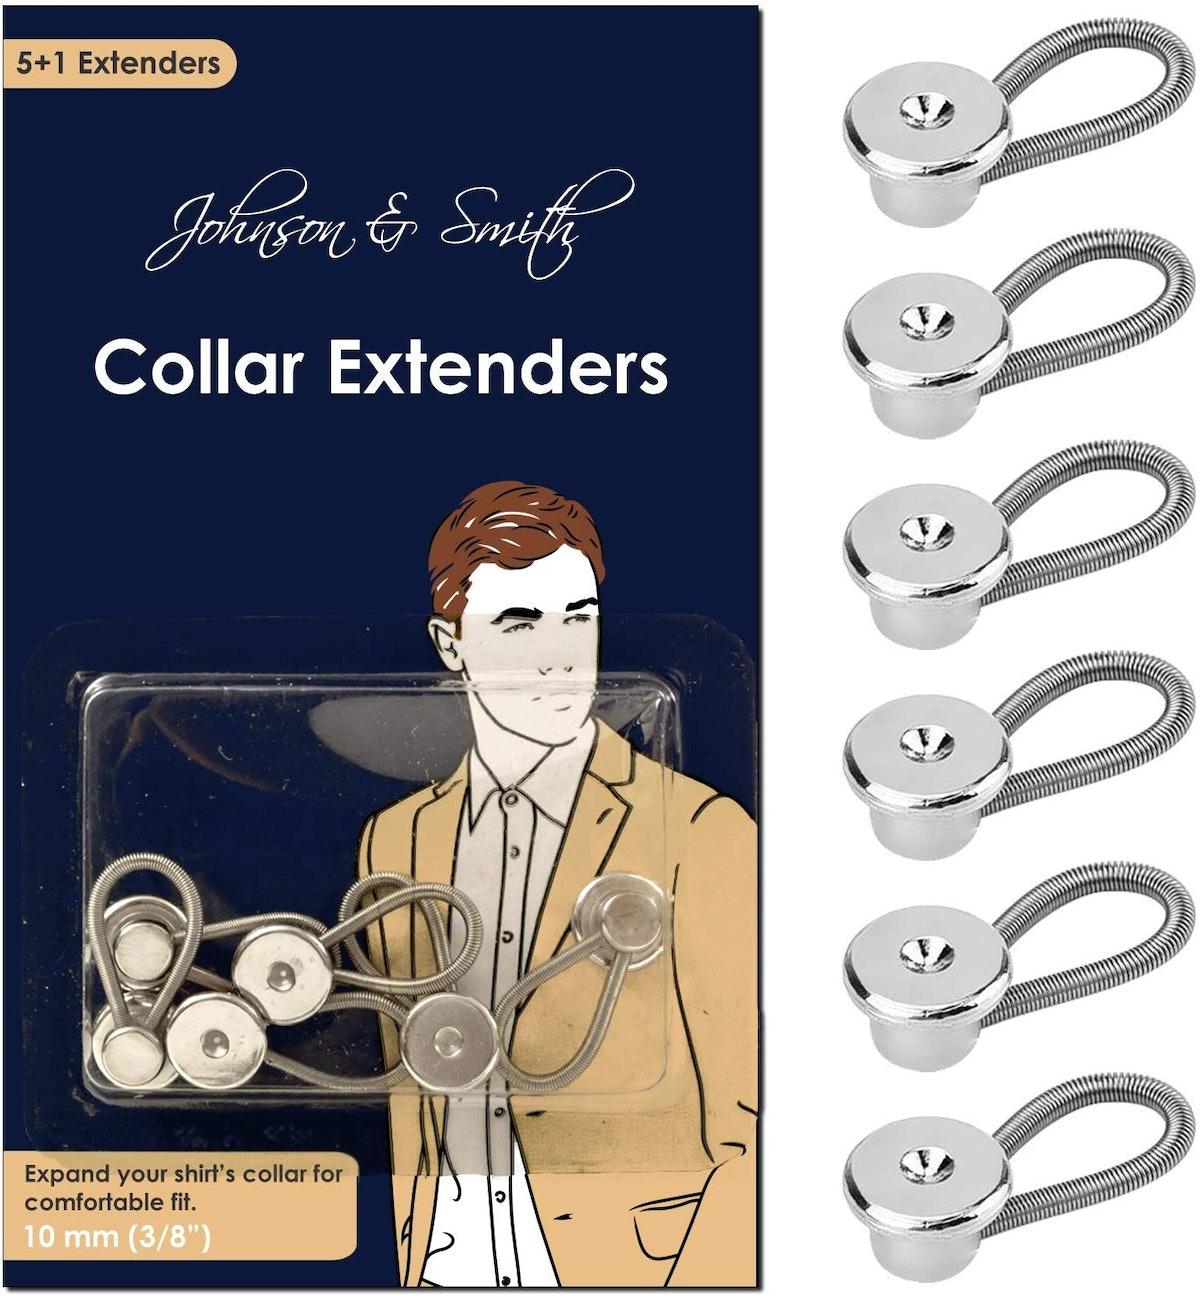 Johnson & Smith Collar Extenders